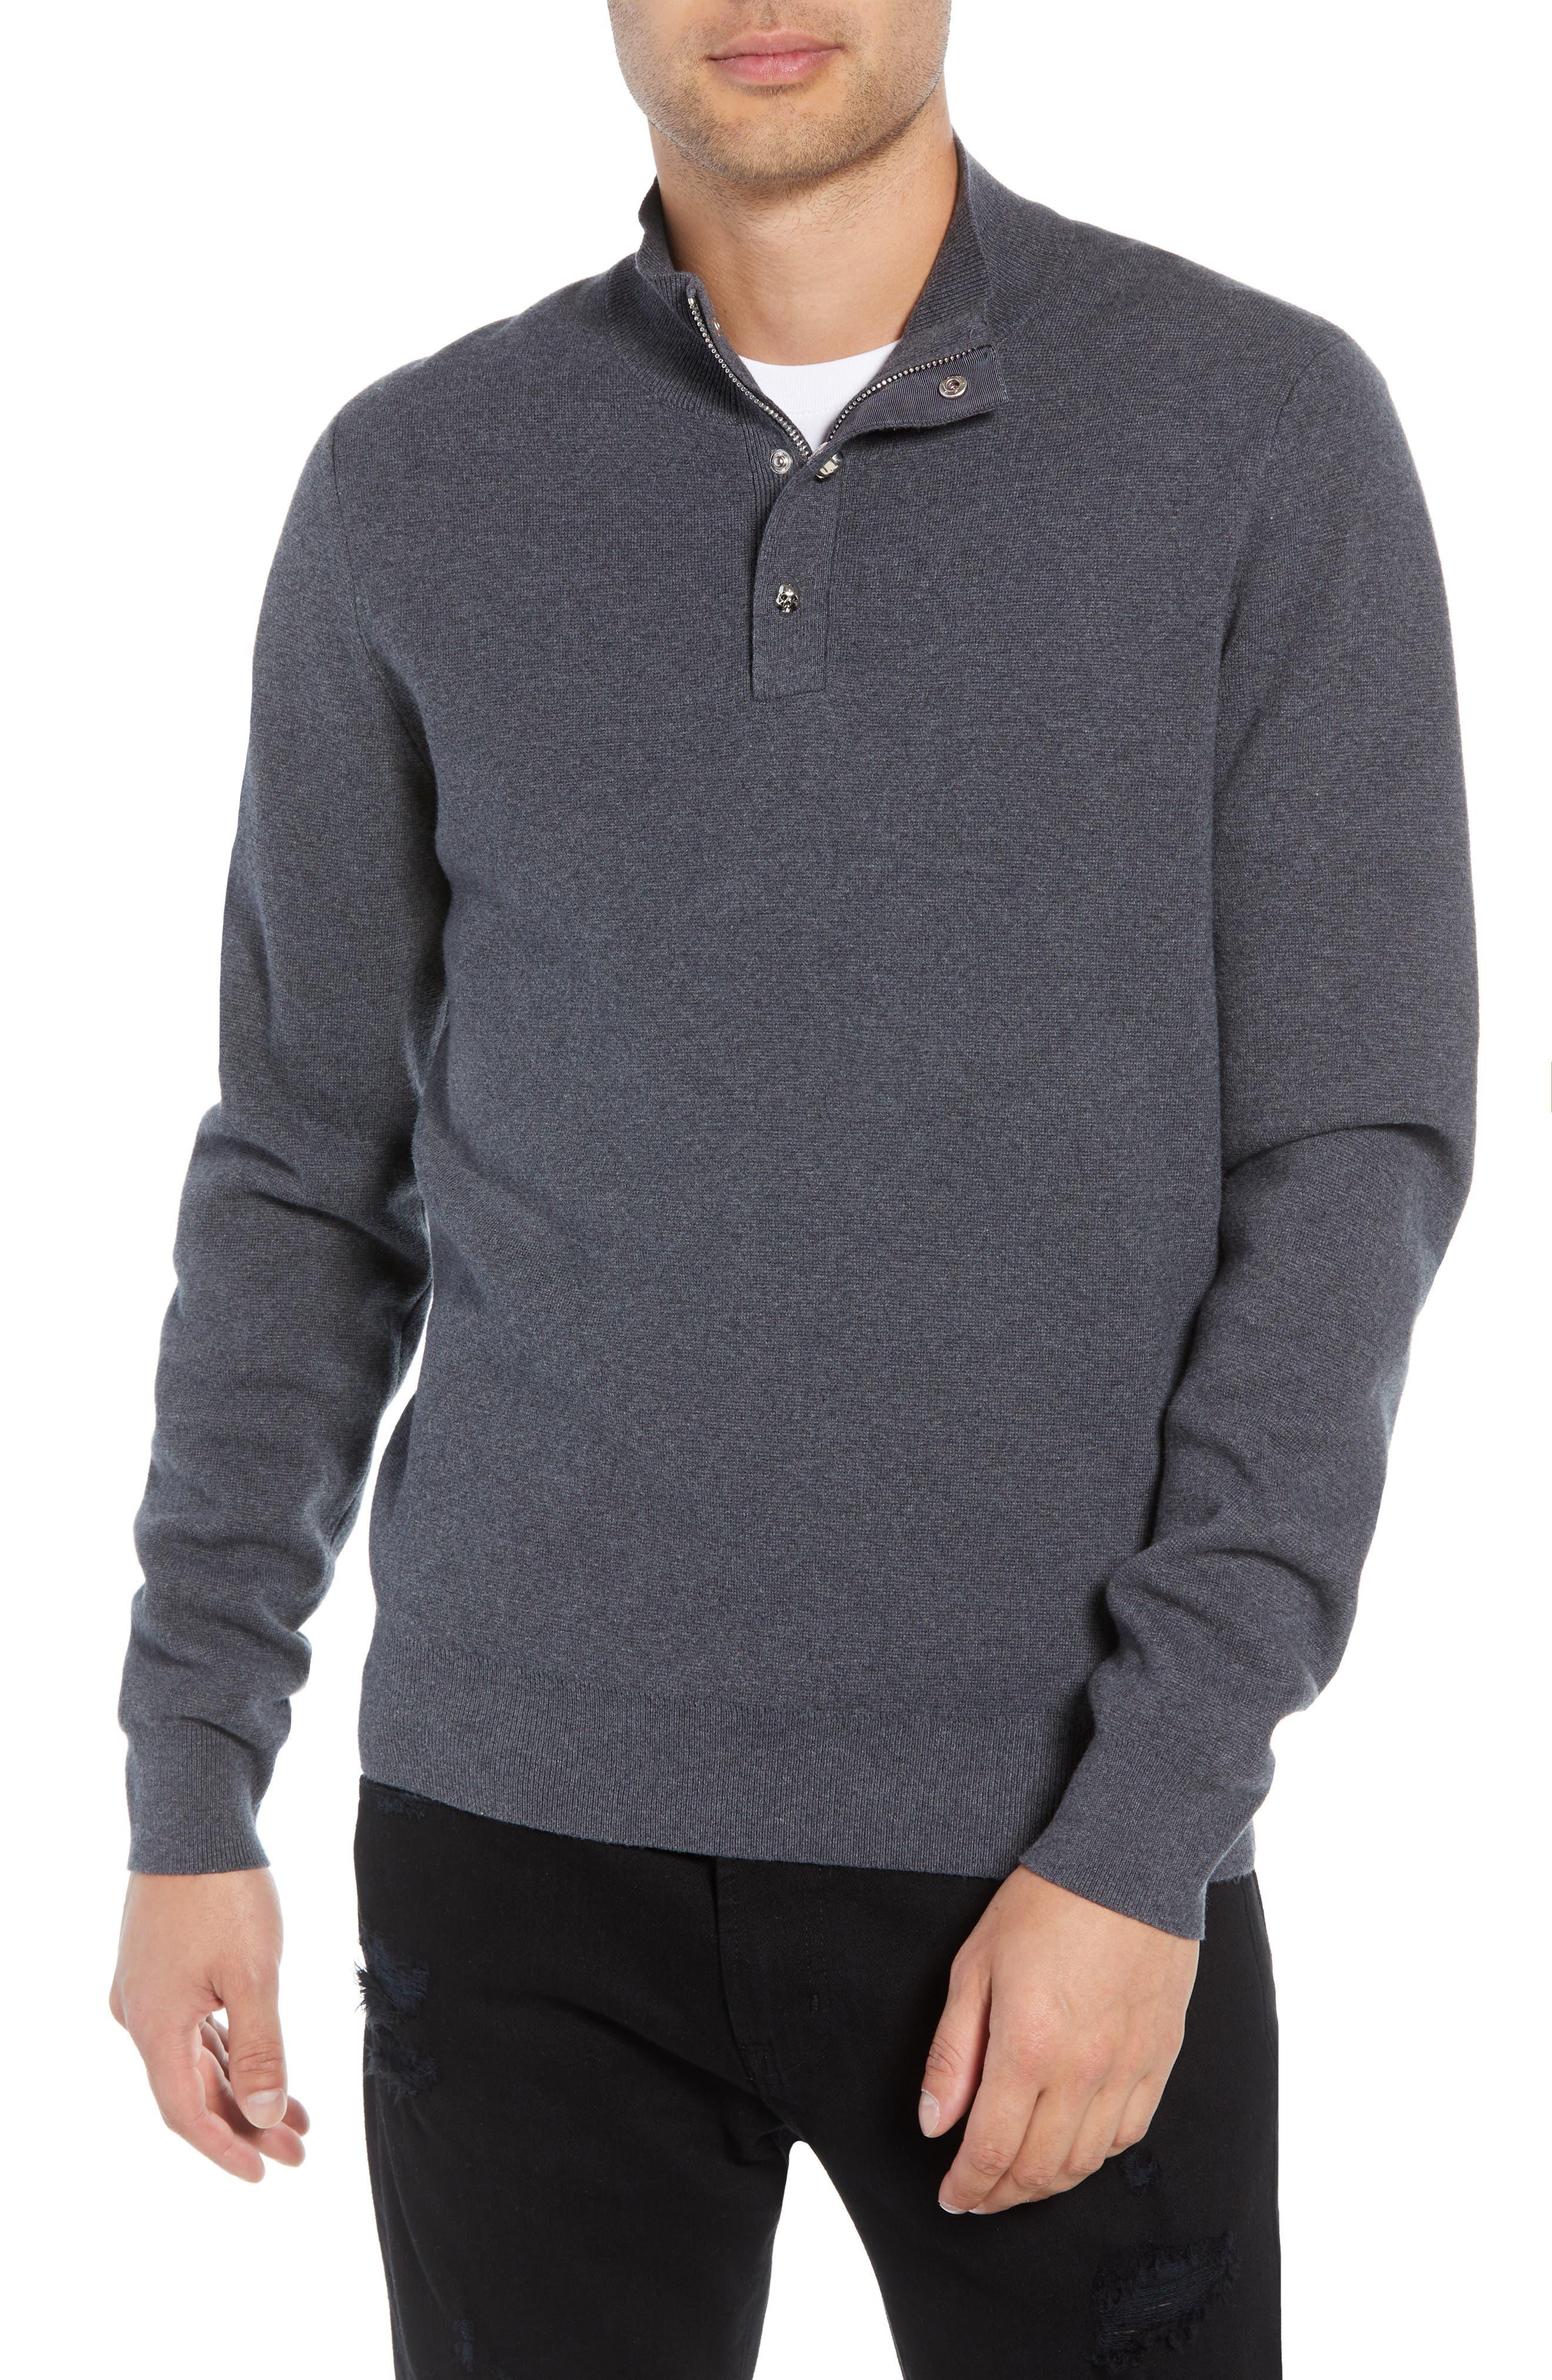 THE KOOPLES Classic Fit Skullhead Sweater in Grey